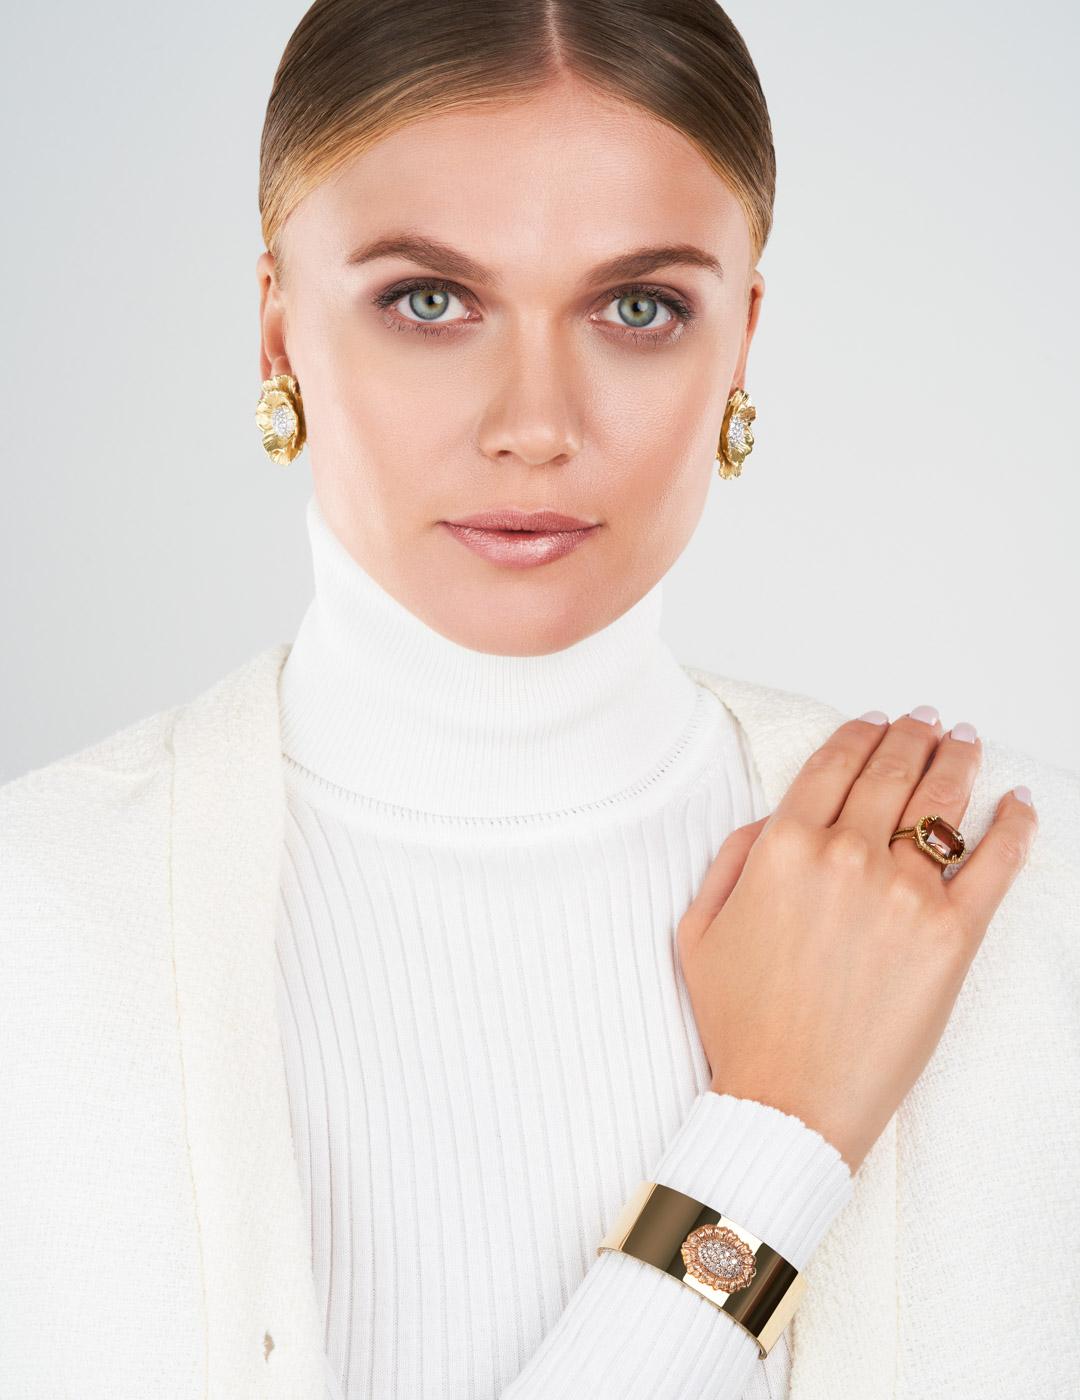 mish_jewelry_product_Nigella-RG-Cuff-3